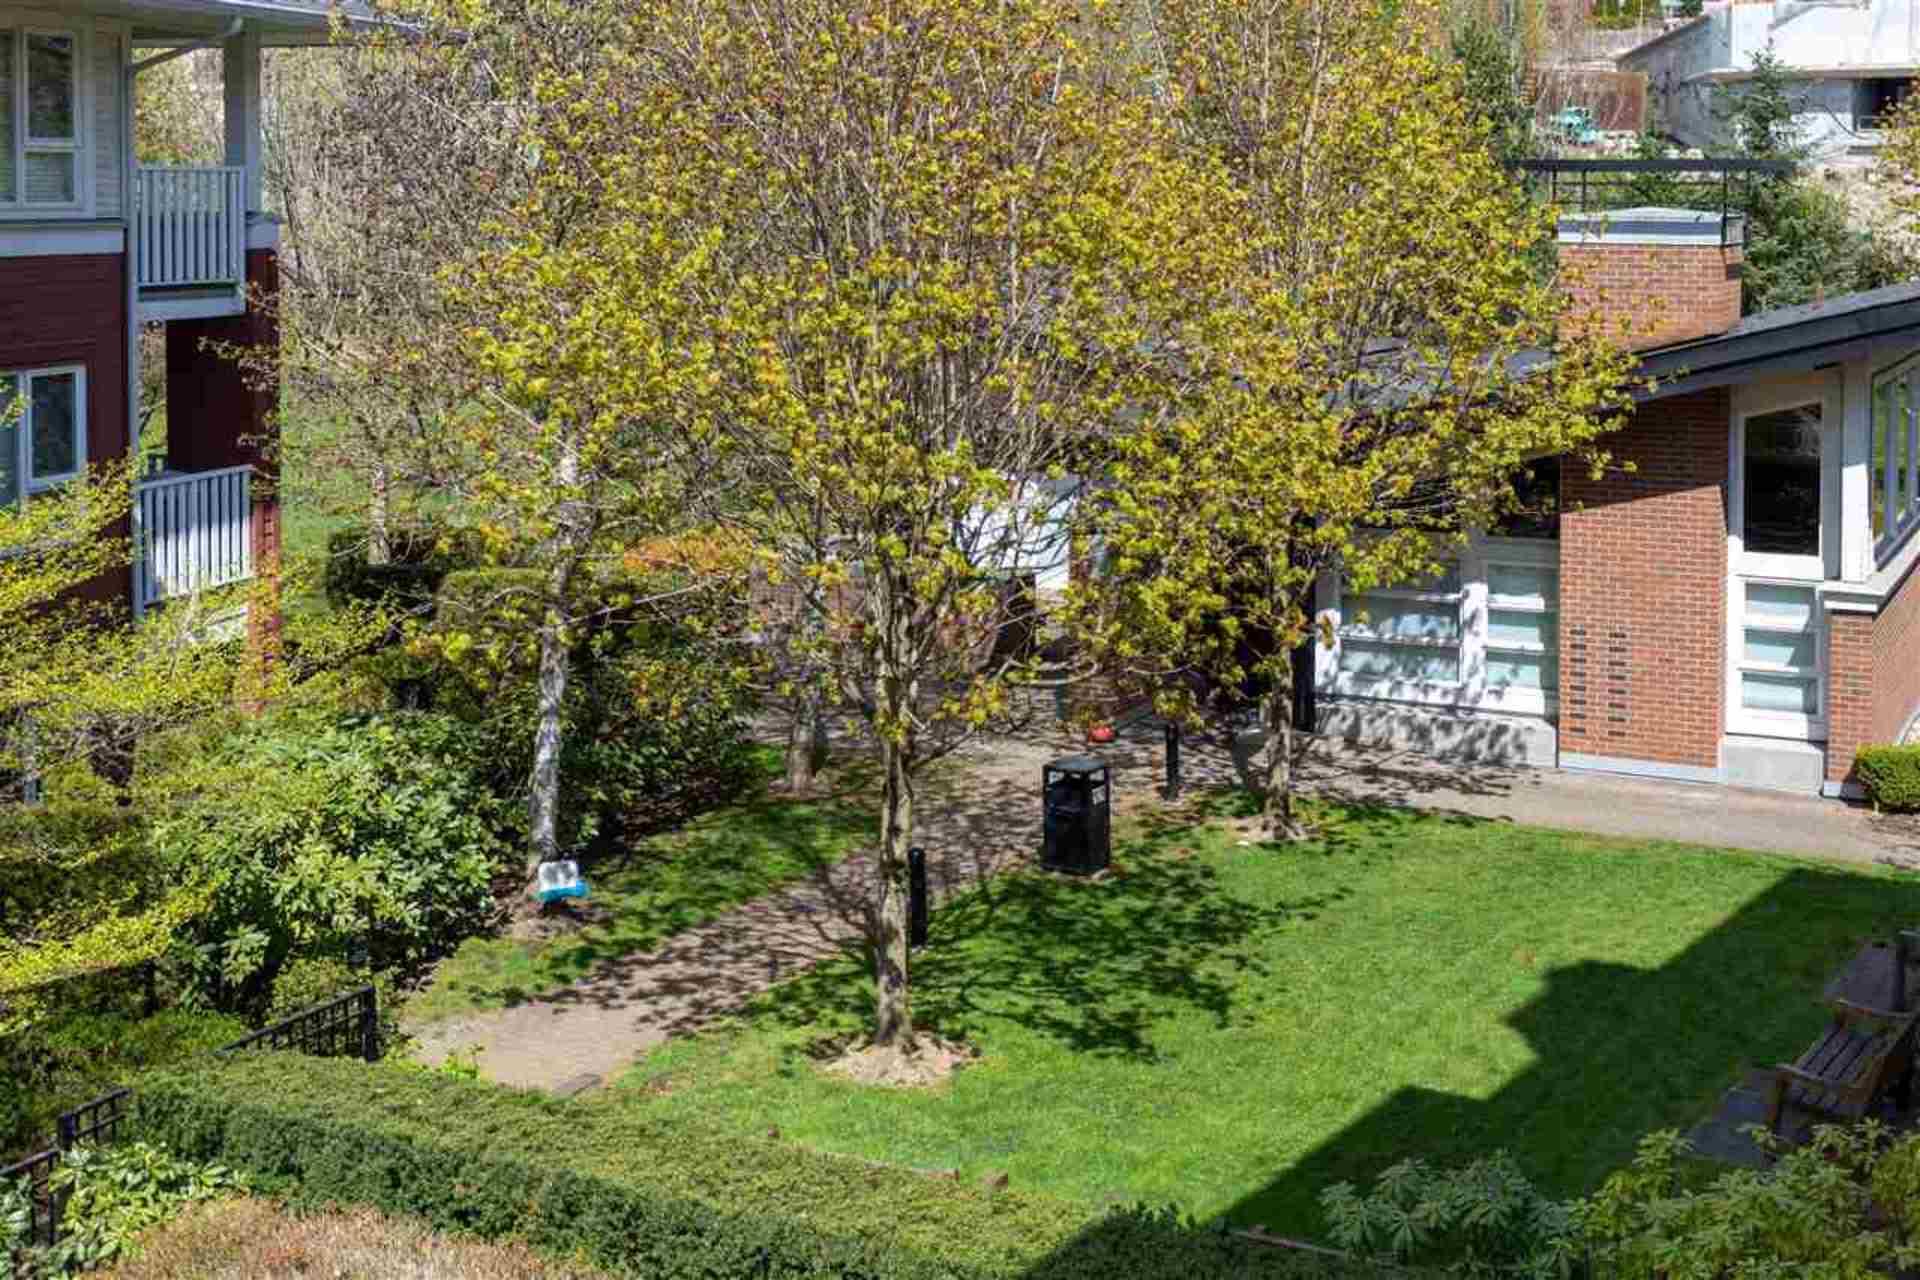 4783-dawson-street-brentwood-park-burnaby-north-20 at 316 - 4783 Dawson Street, Brentwood Park, Burnaby North